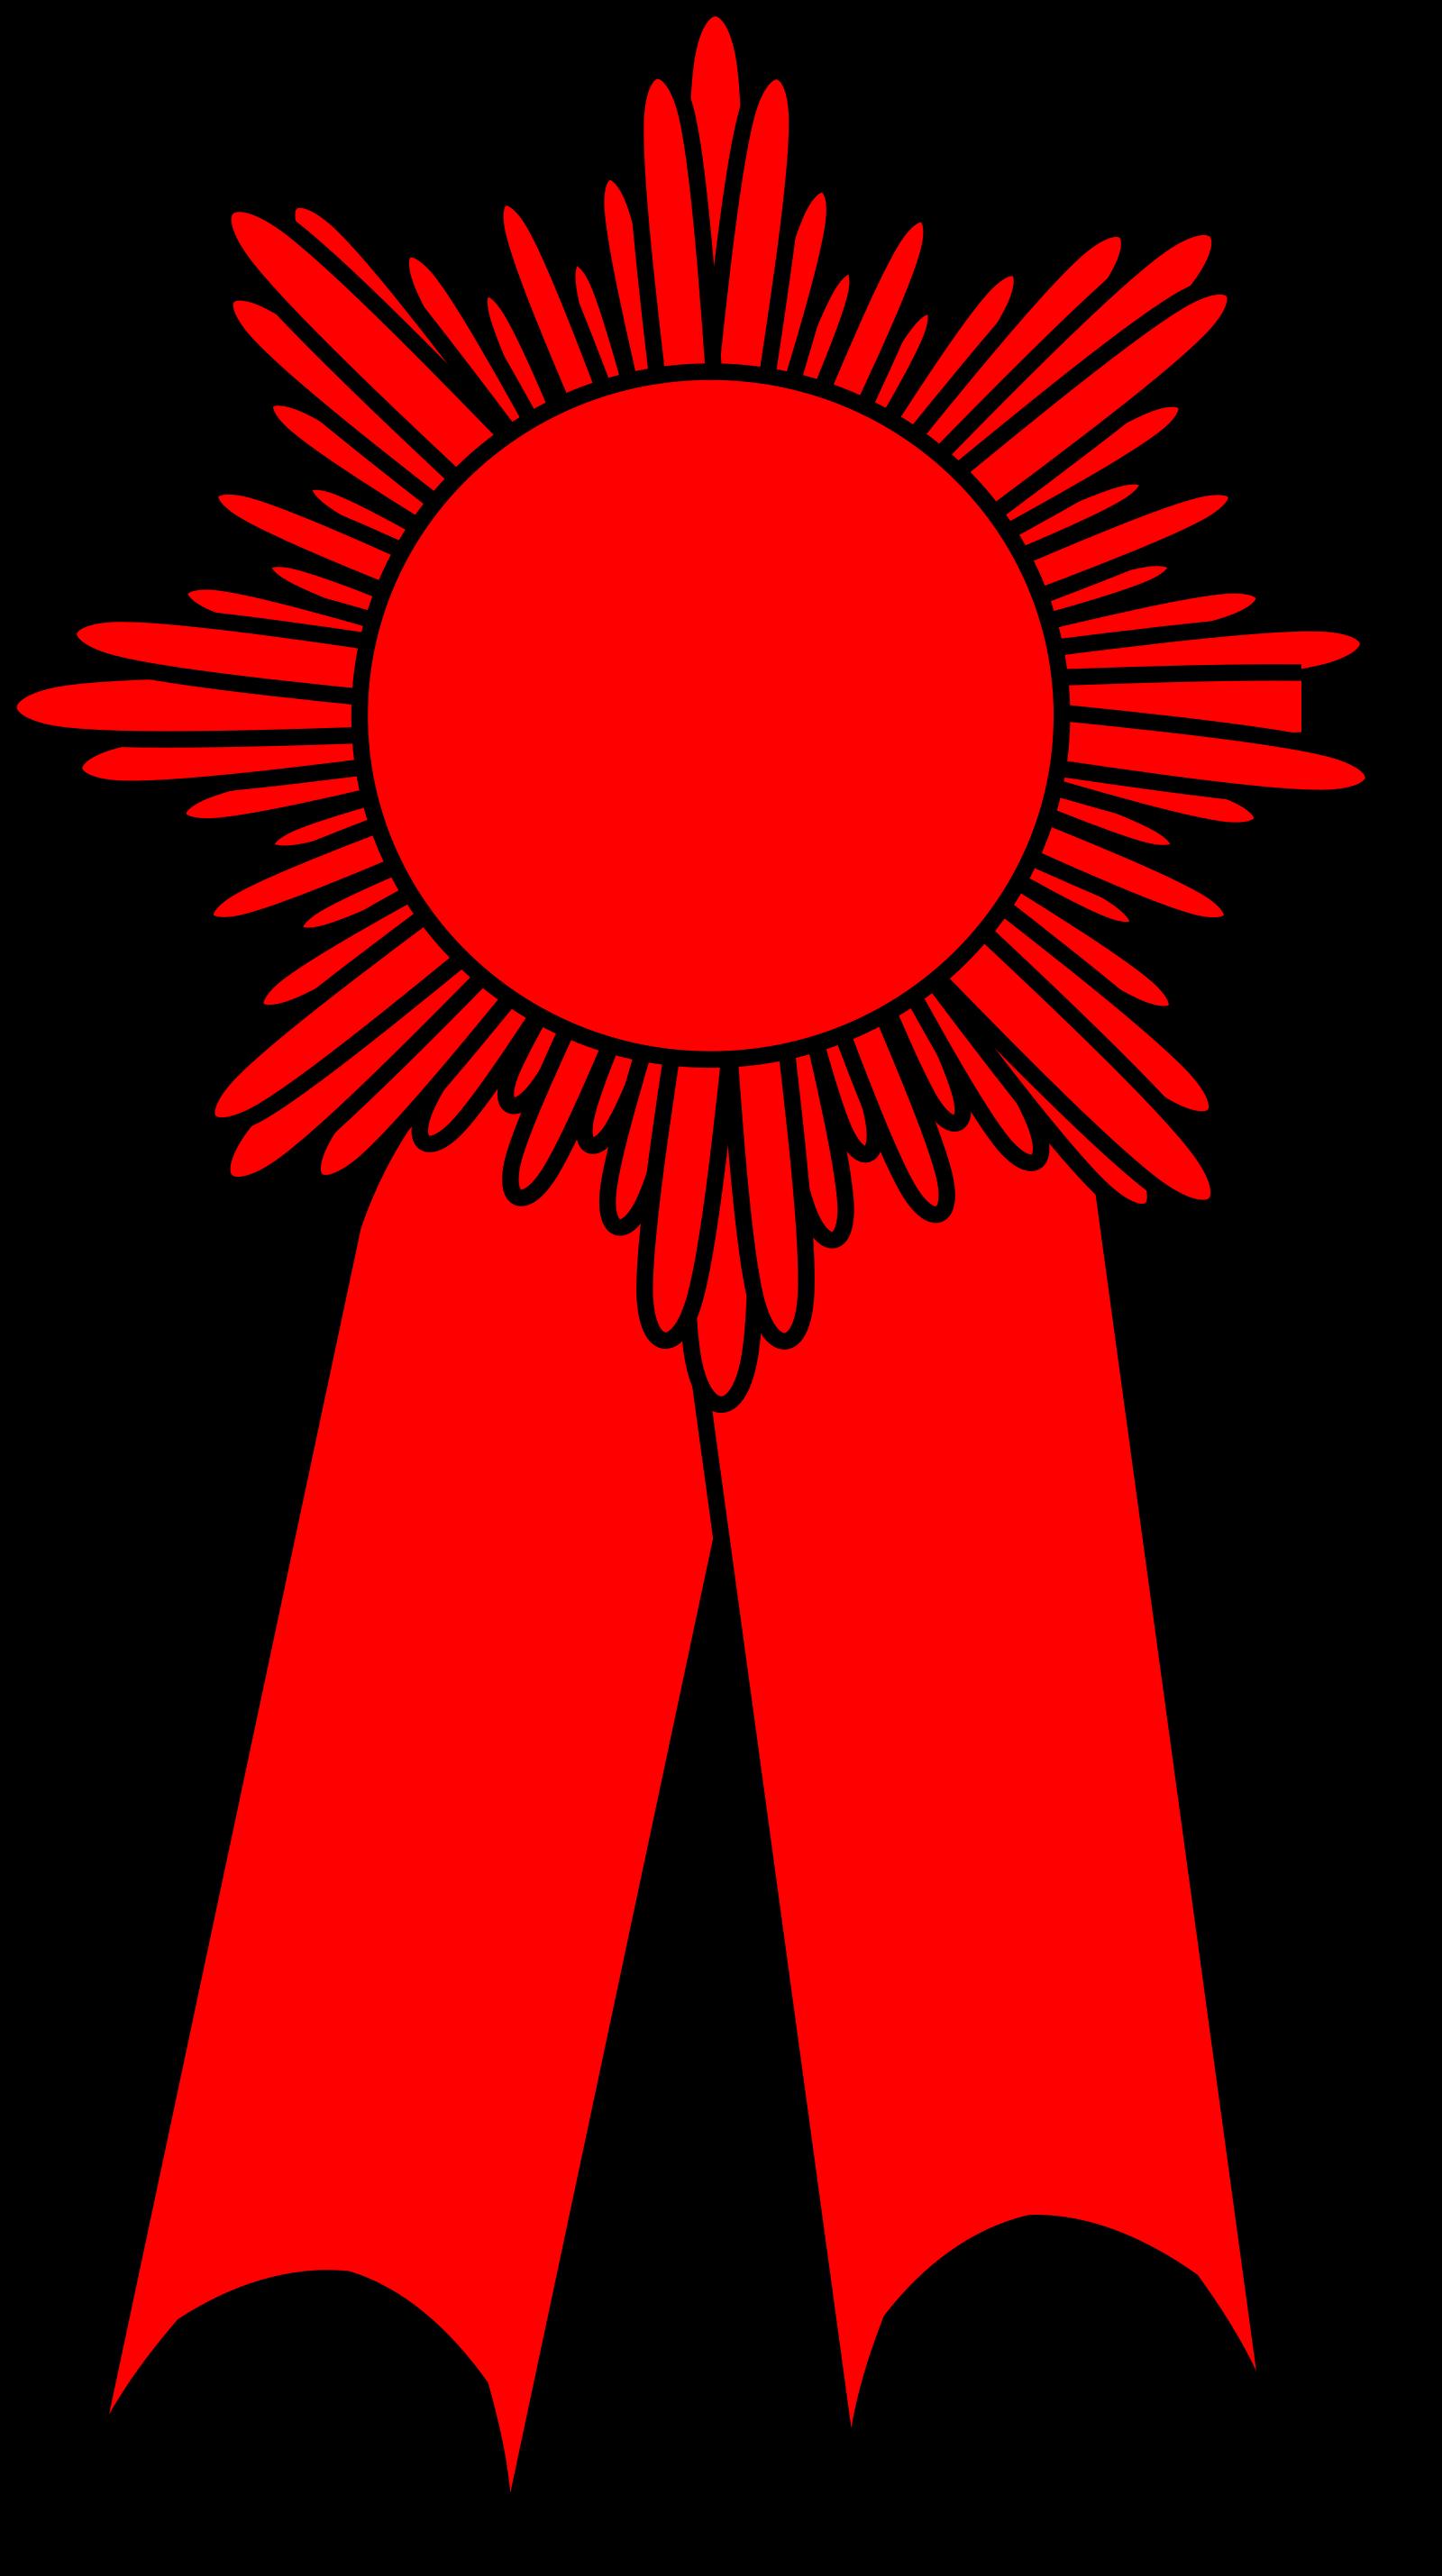 Red SVG Clip arts